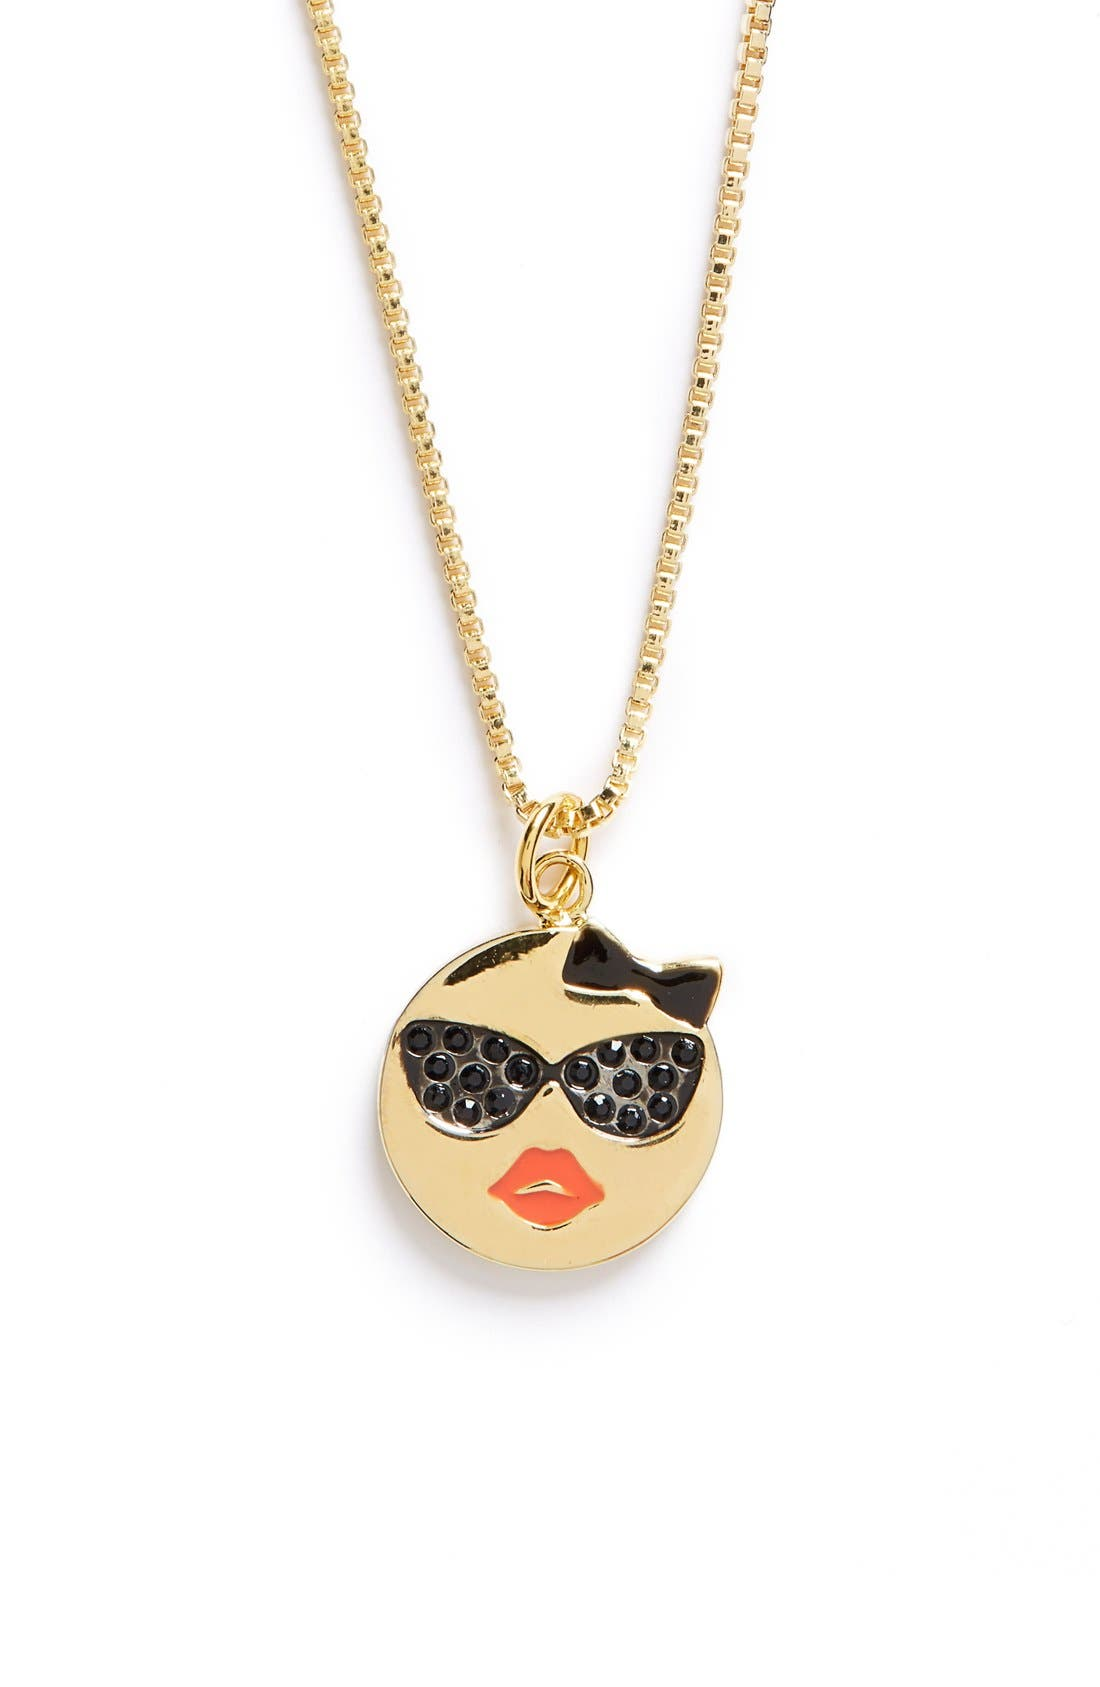 Main Image - kate spade new york 'tell all' emoji pendant necklace